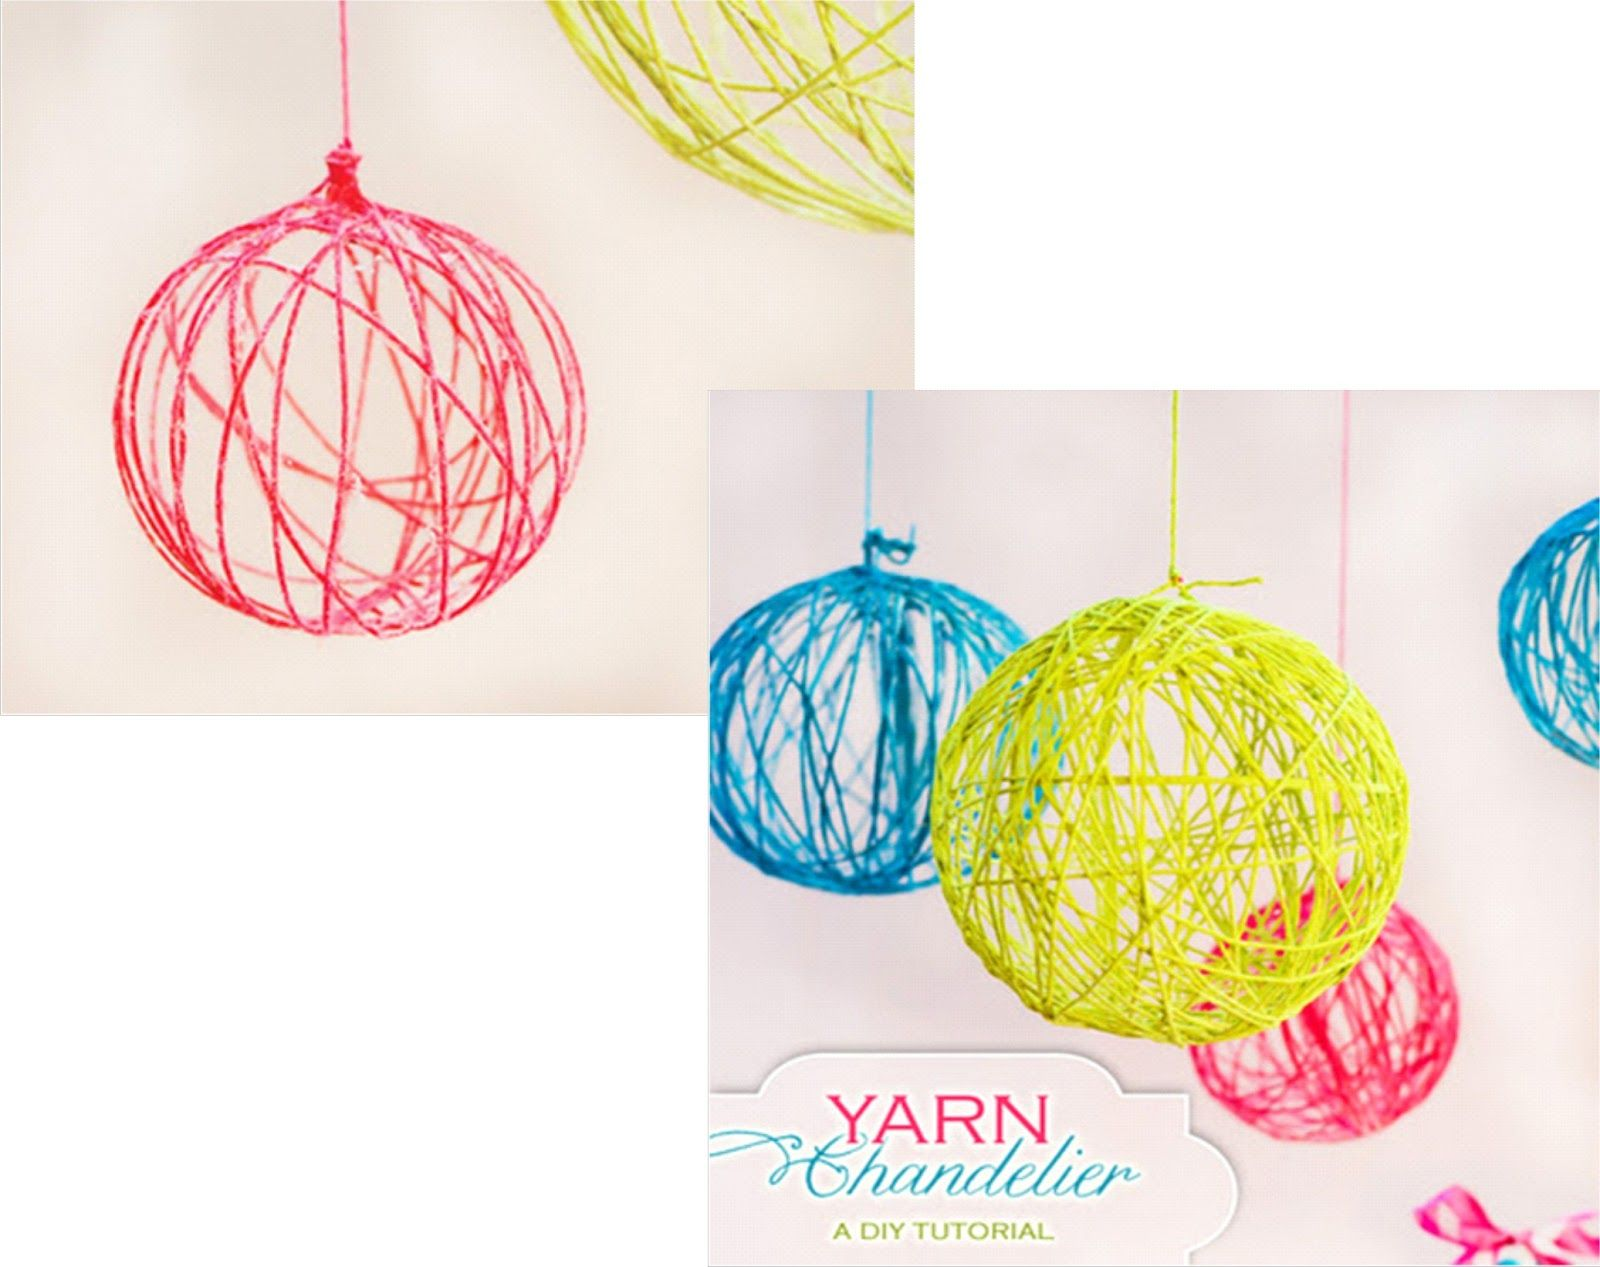 Arte color bola esfera de fique cabuya o lana - Bolas para decorar ...